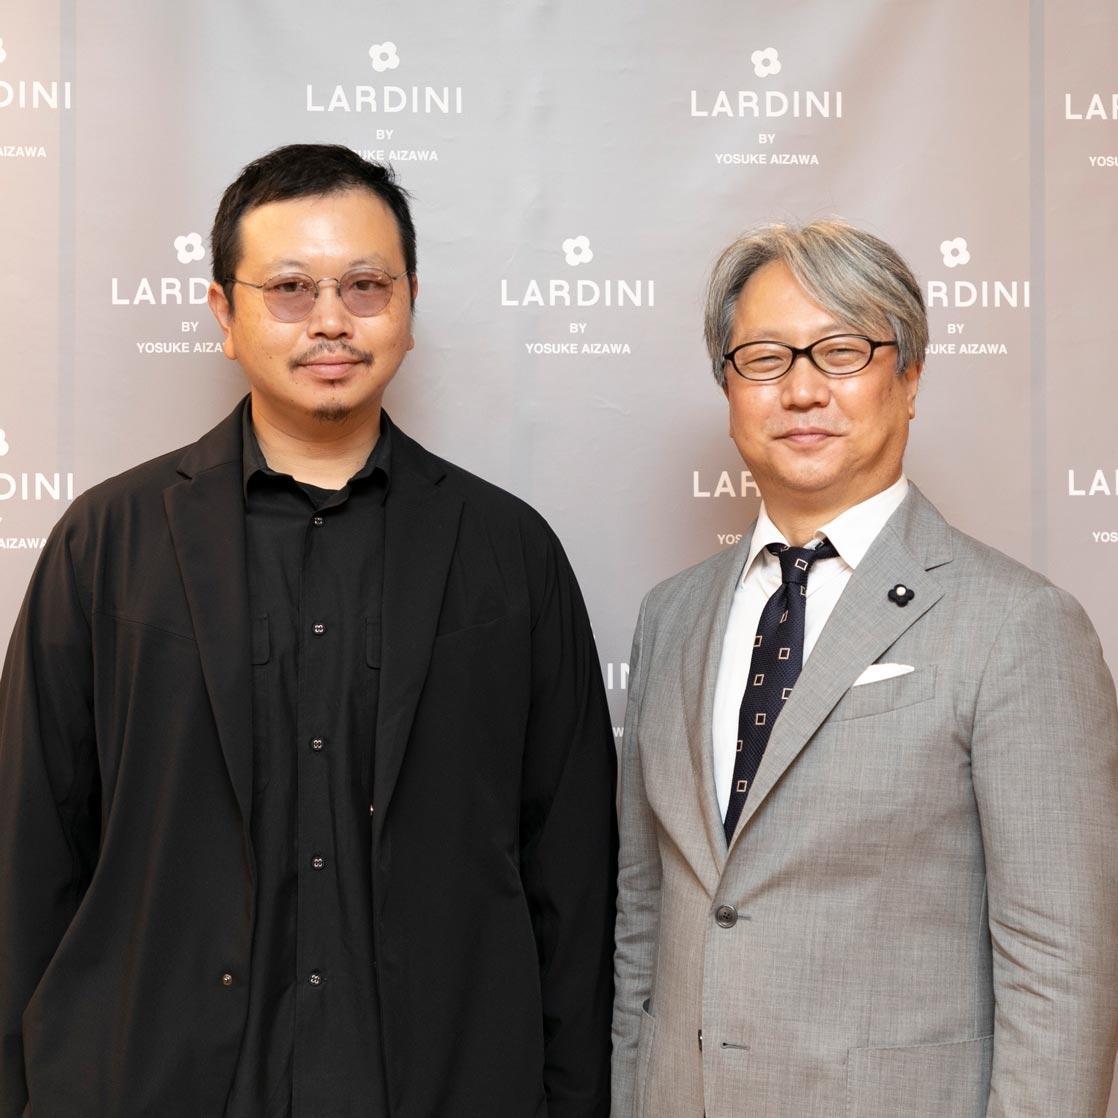 lardini_by_yosukeaizawa_event_4.jpg